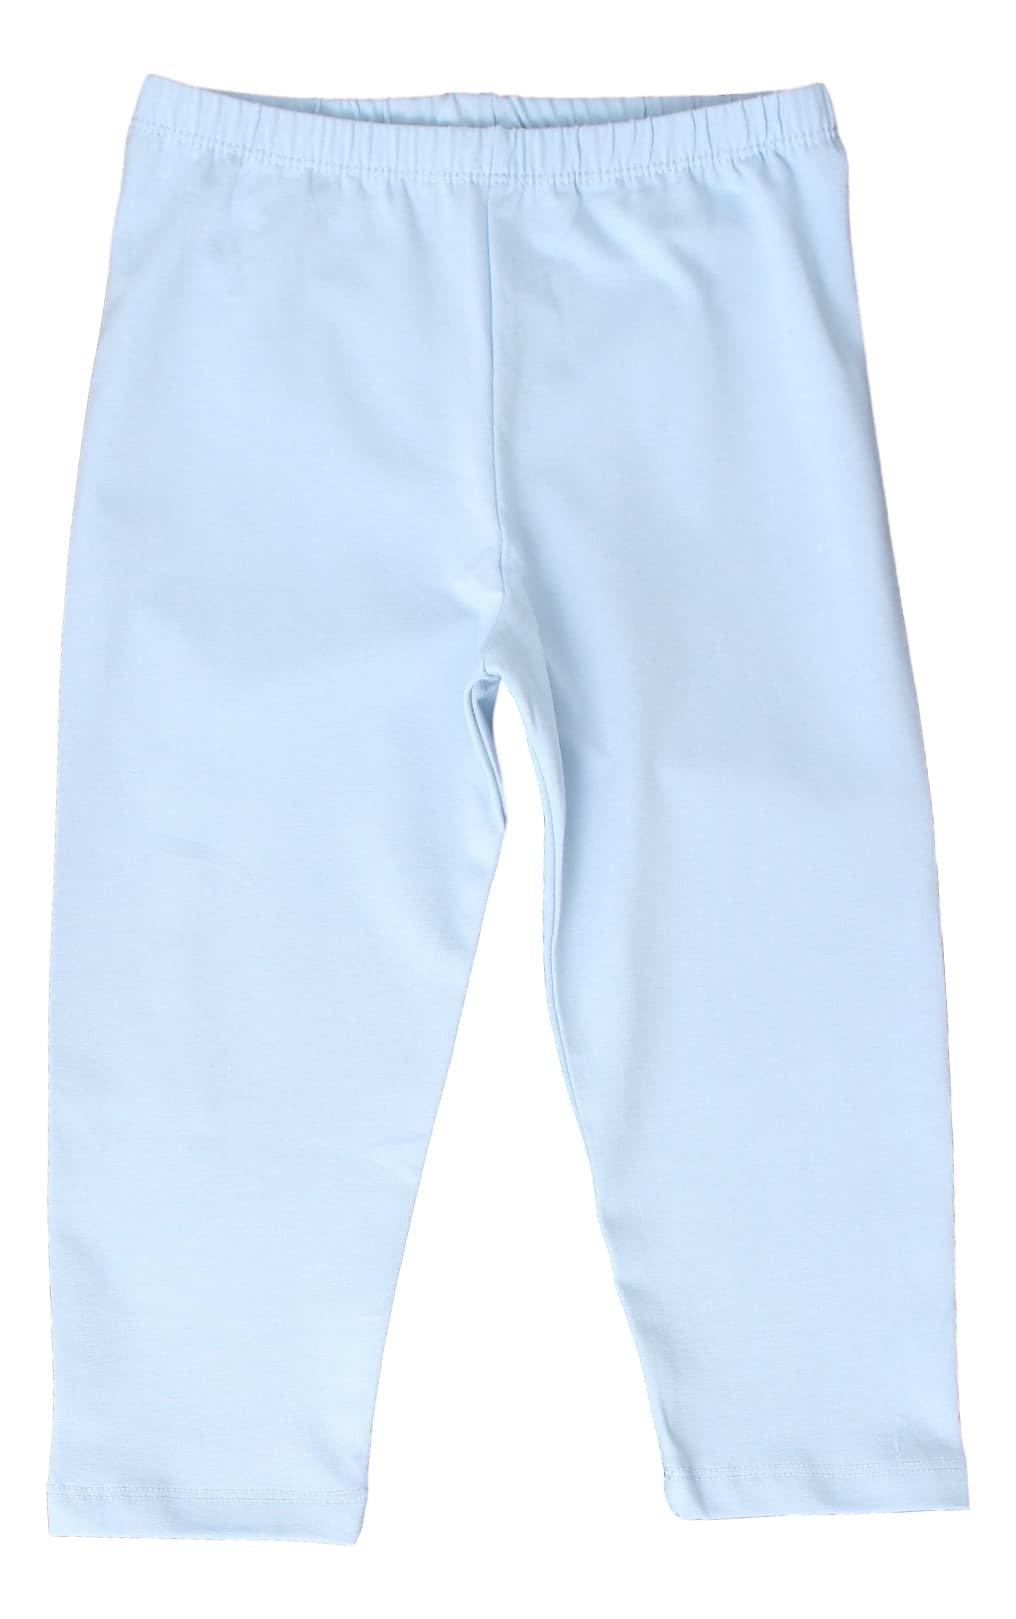 CAOMP Girl's Capri Crop Leggings, Organic Cotton Spandex, School or Play Light Blue 3 / 4